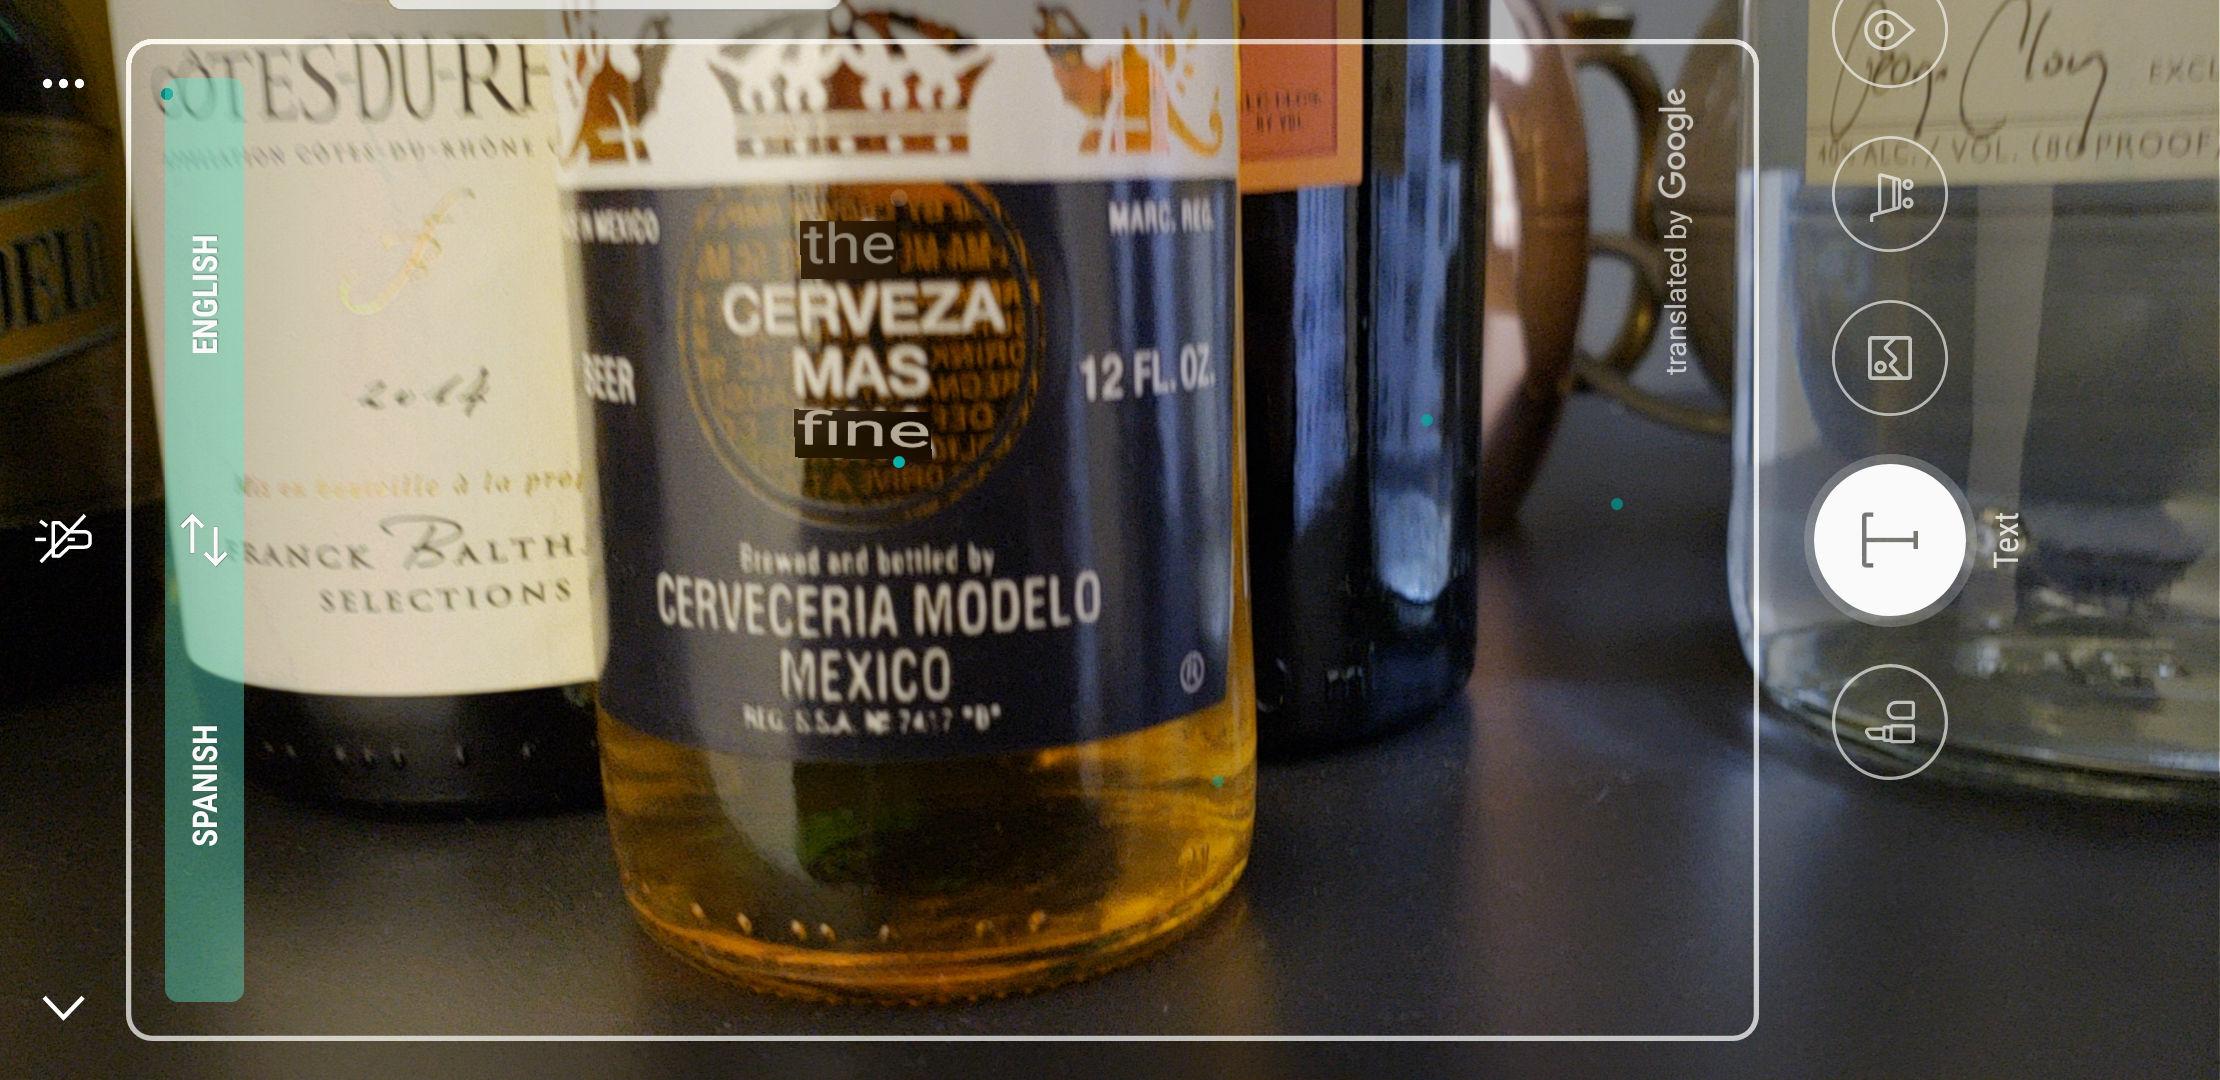 screenshot 20180307 142302 bixby vision - Samsung Galaxy S9+ review – TechCrunch